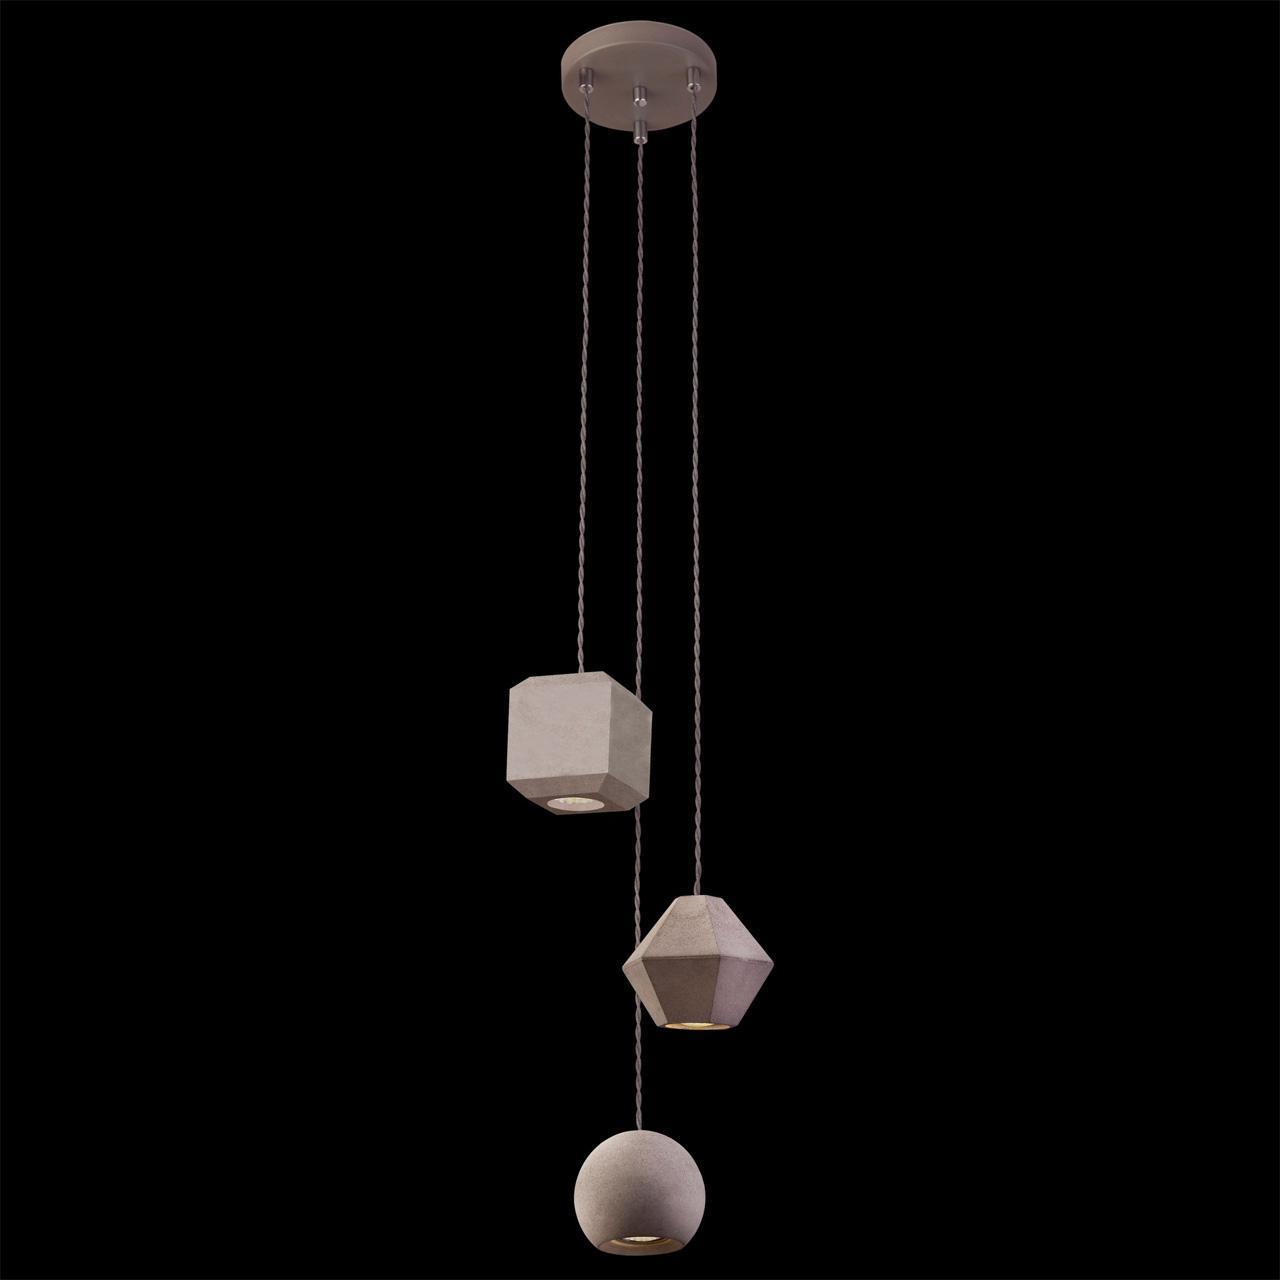 Люстра Nowodvorski Geometric 9695 подвесная delicate noctilucence hollow out geometric shape pendant necklace